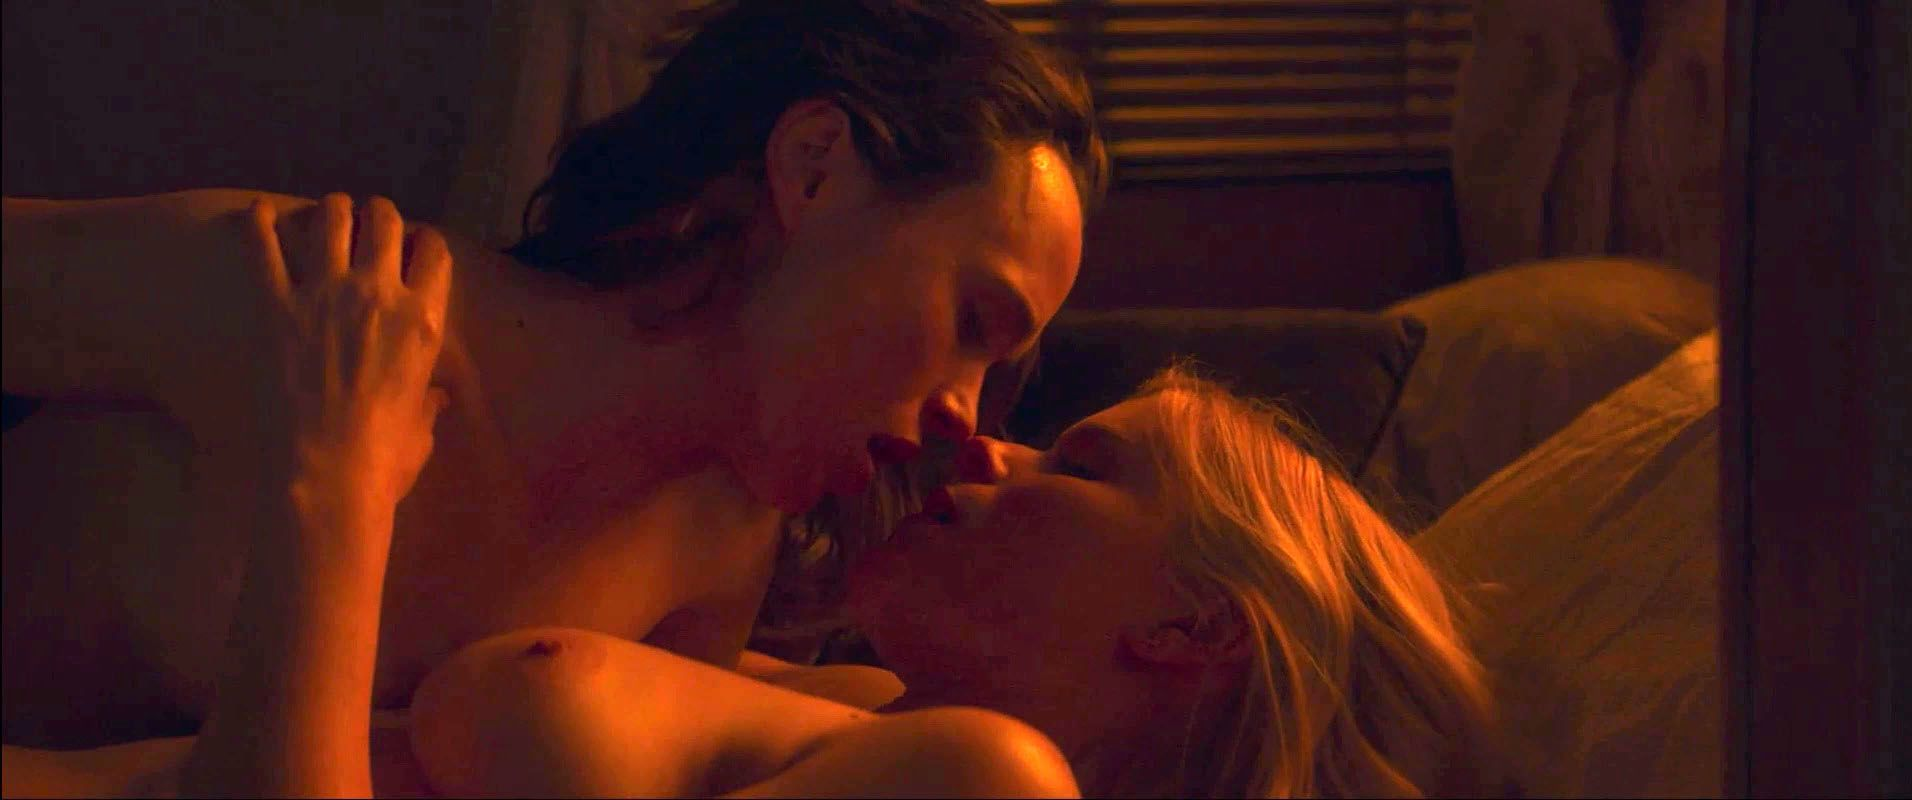 0418173952100_05_Kate-Mara-Ellen-Page-Nude-TheFappeningBlog.com-6-2.jpg